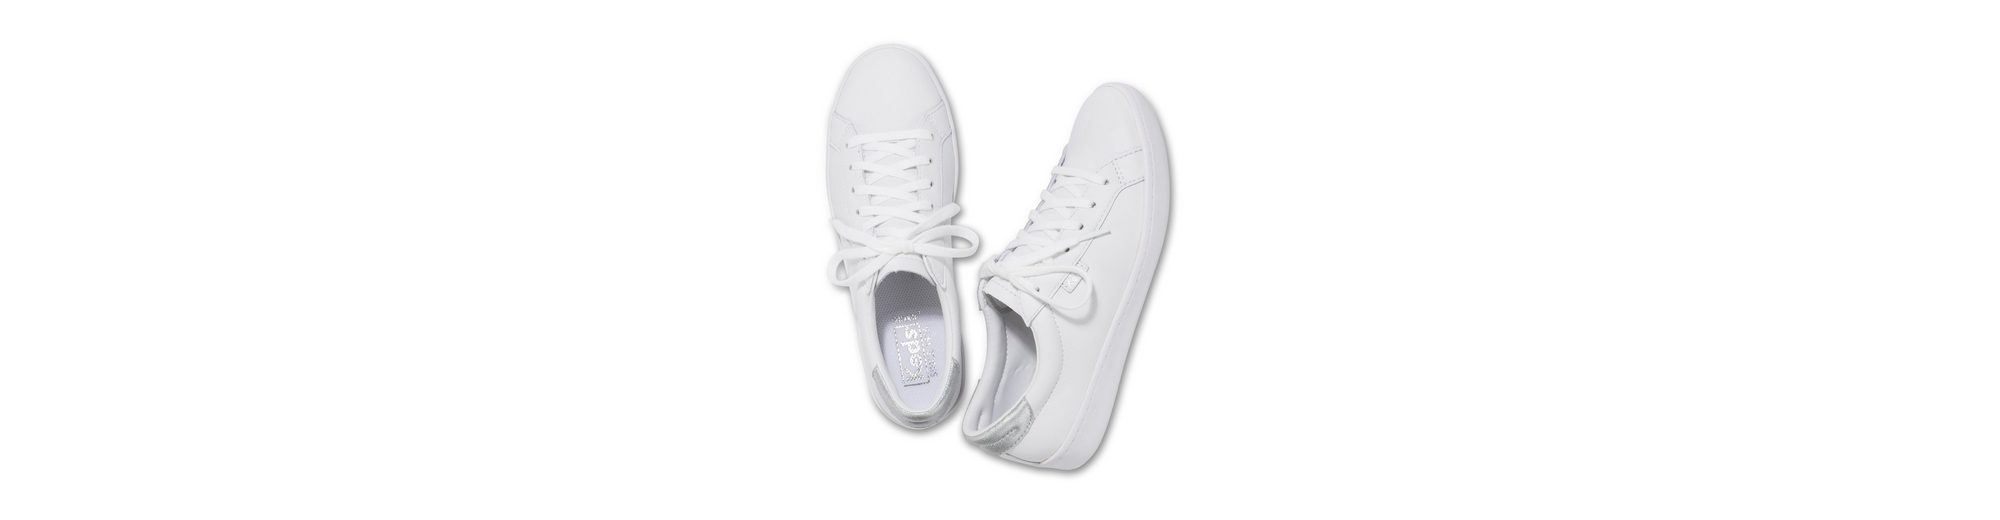 Billig 2018 Unisex Keds Ace Leather Sneaker Freies Verschiffen Extrem hwWZiUV